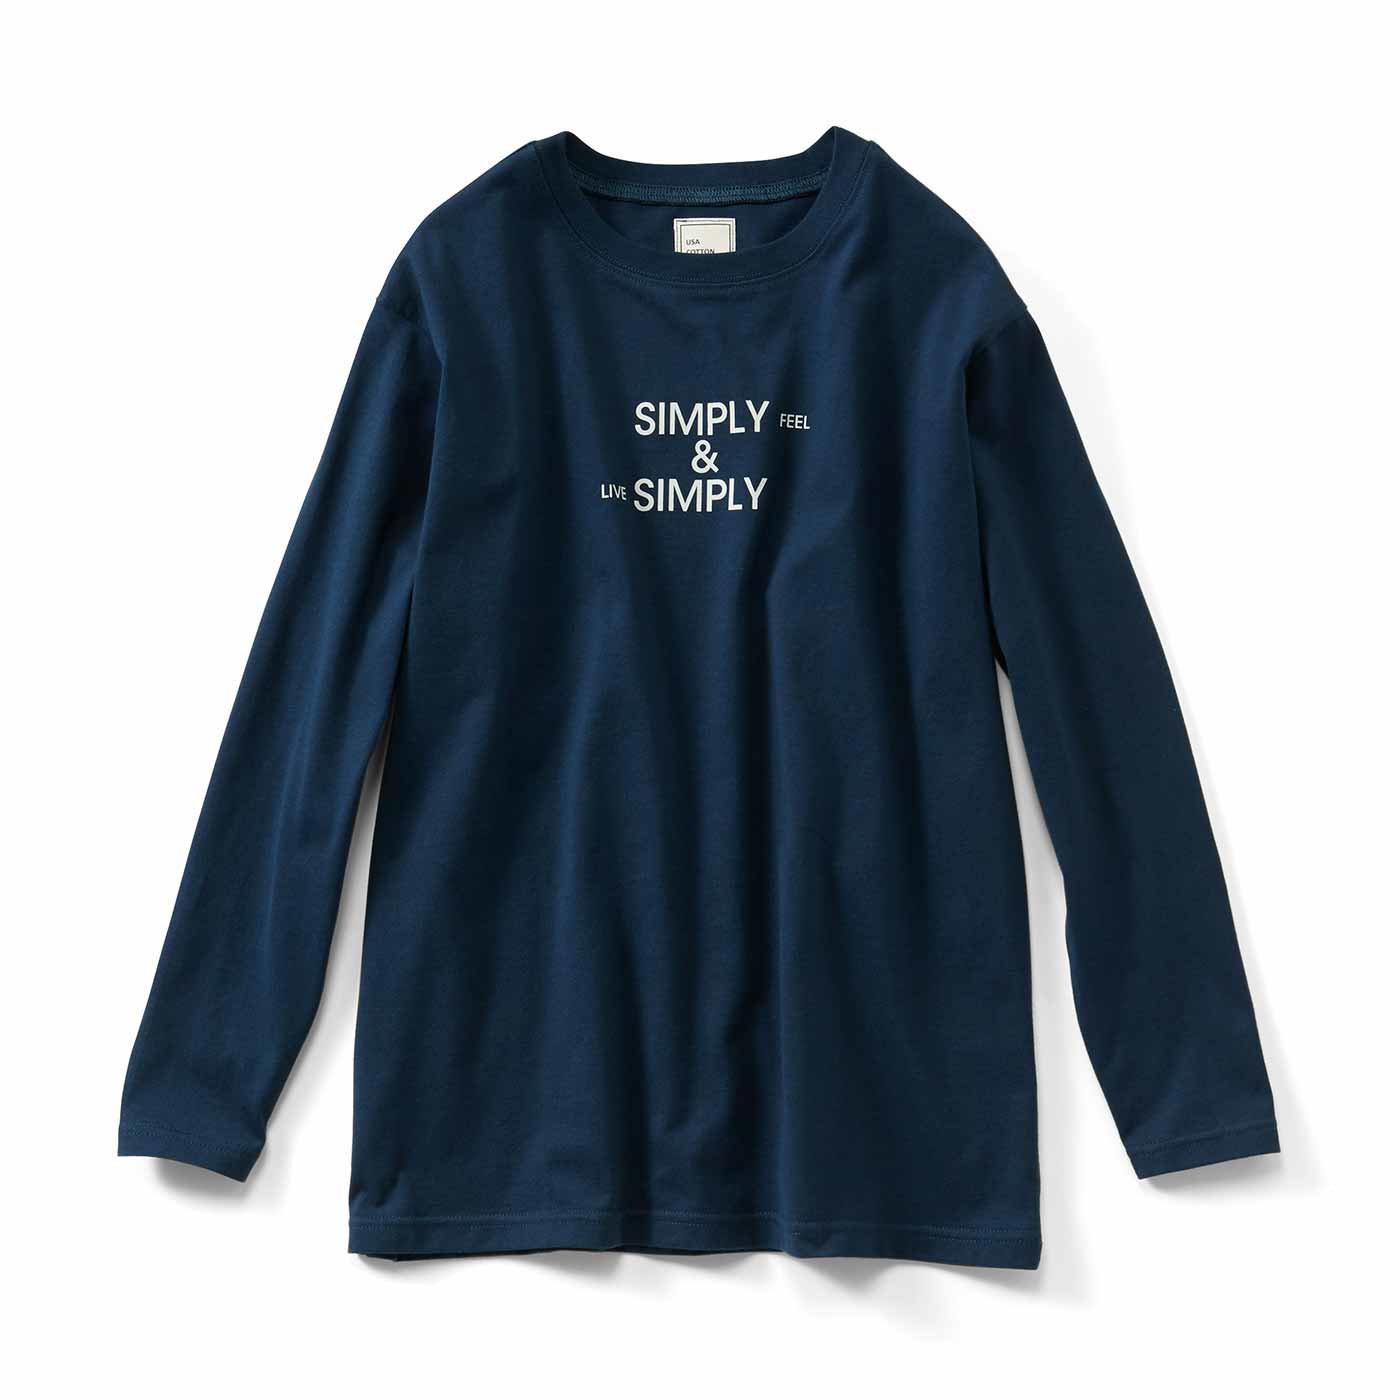 IEDIT[イディット] USAコットンの大人ロゴTシャツ〈ネイビー〉